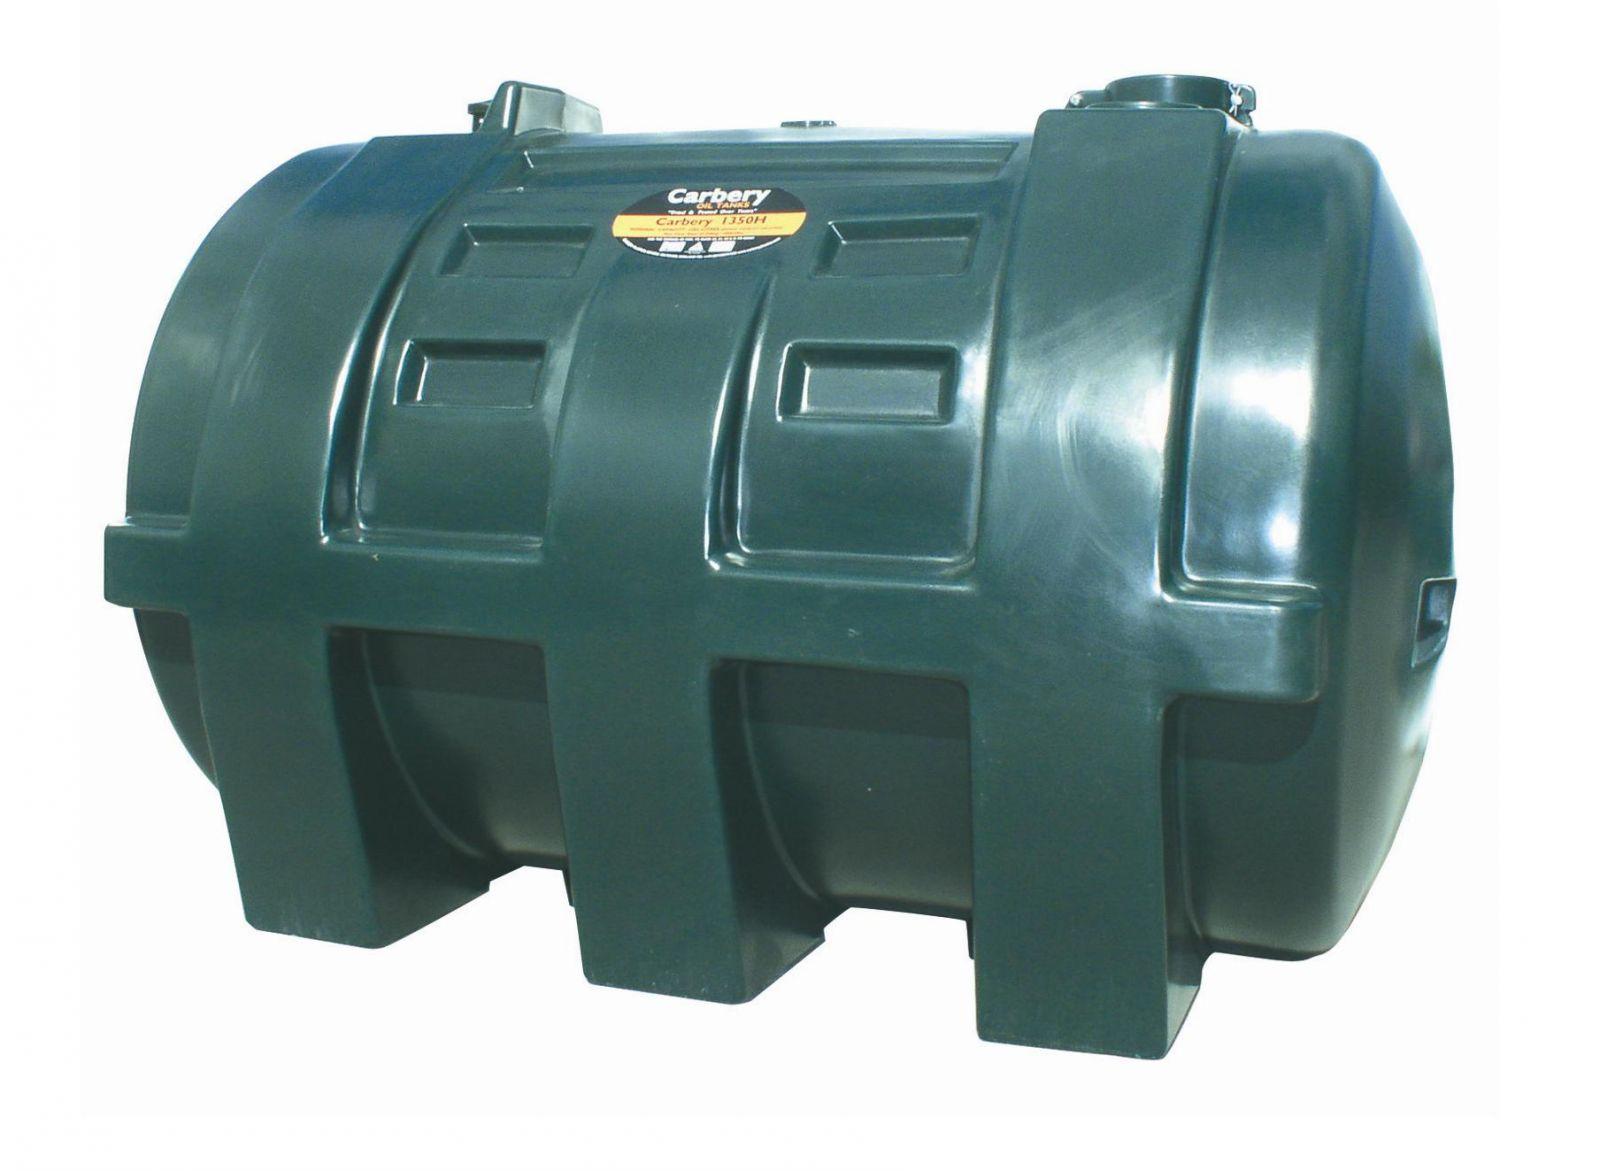 Carbery 1350H Horizontal Single Skin Oil Tank